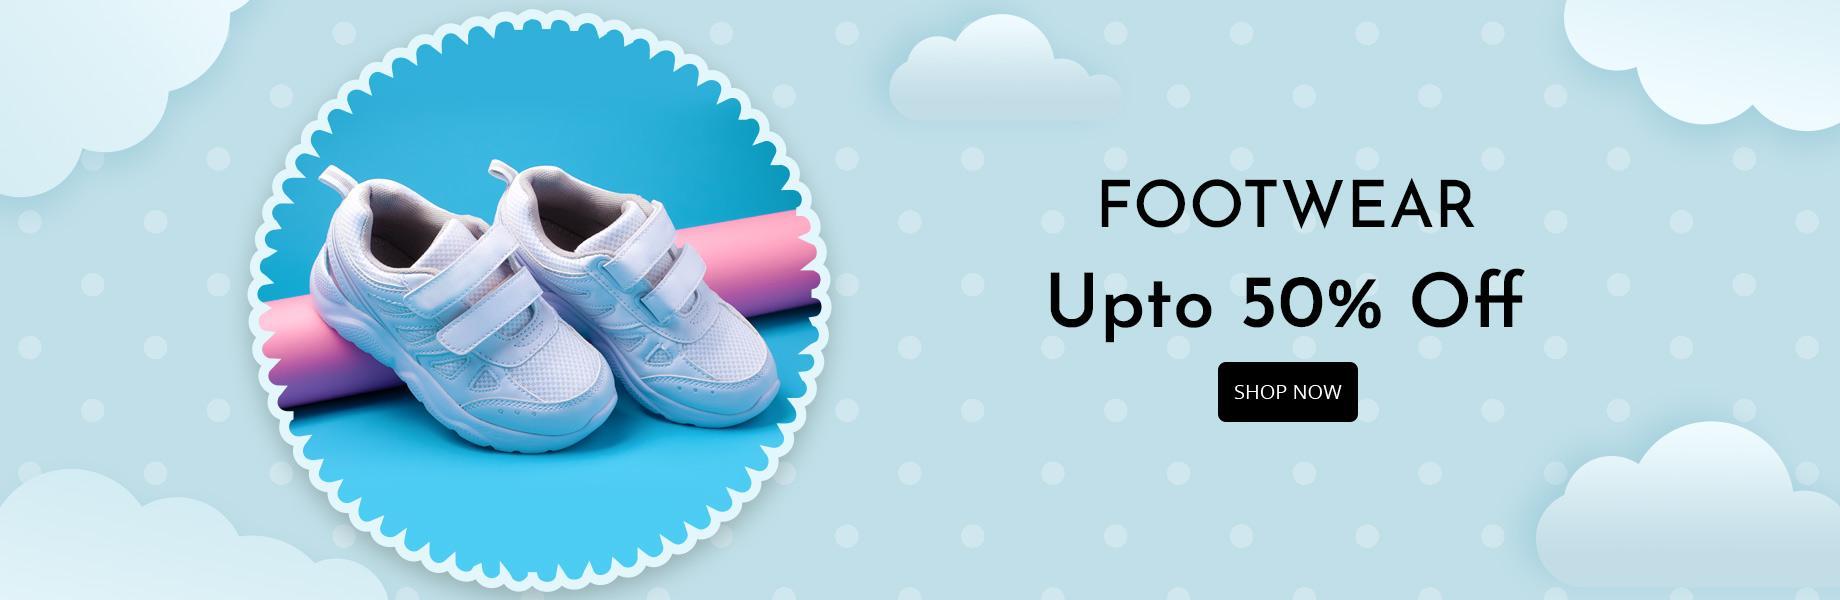 Kids-Page-Carousals-Footwear-Web.jpg